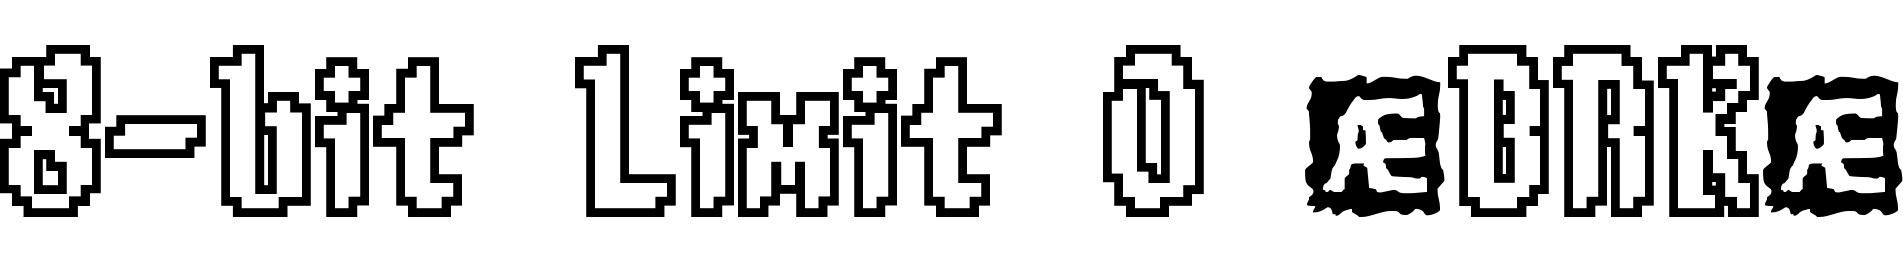 8-bit Limit O (BRK)